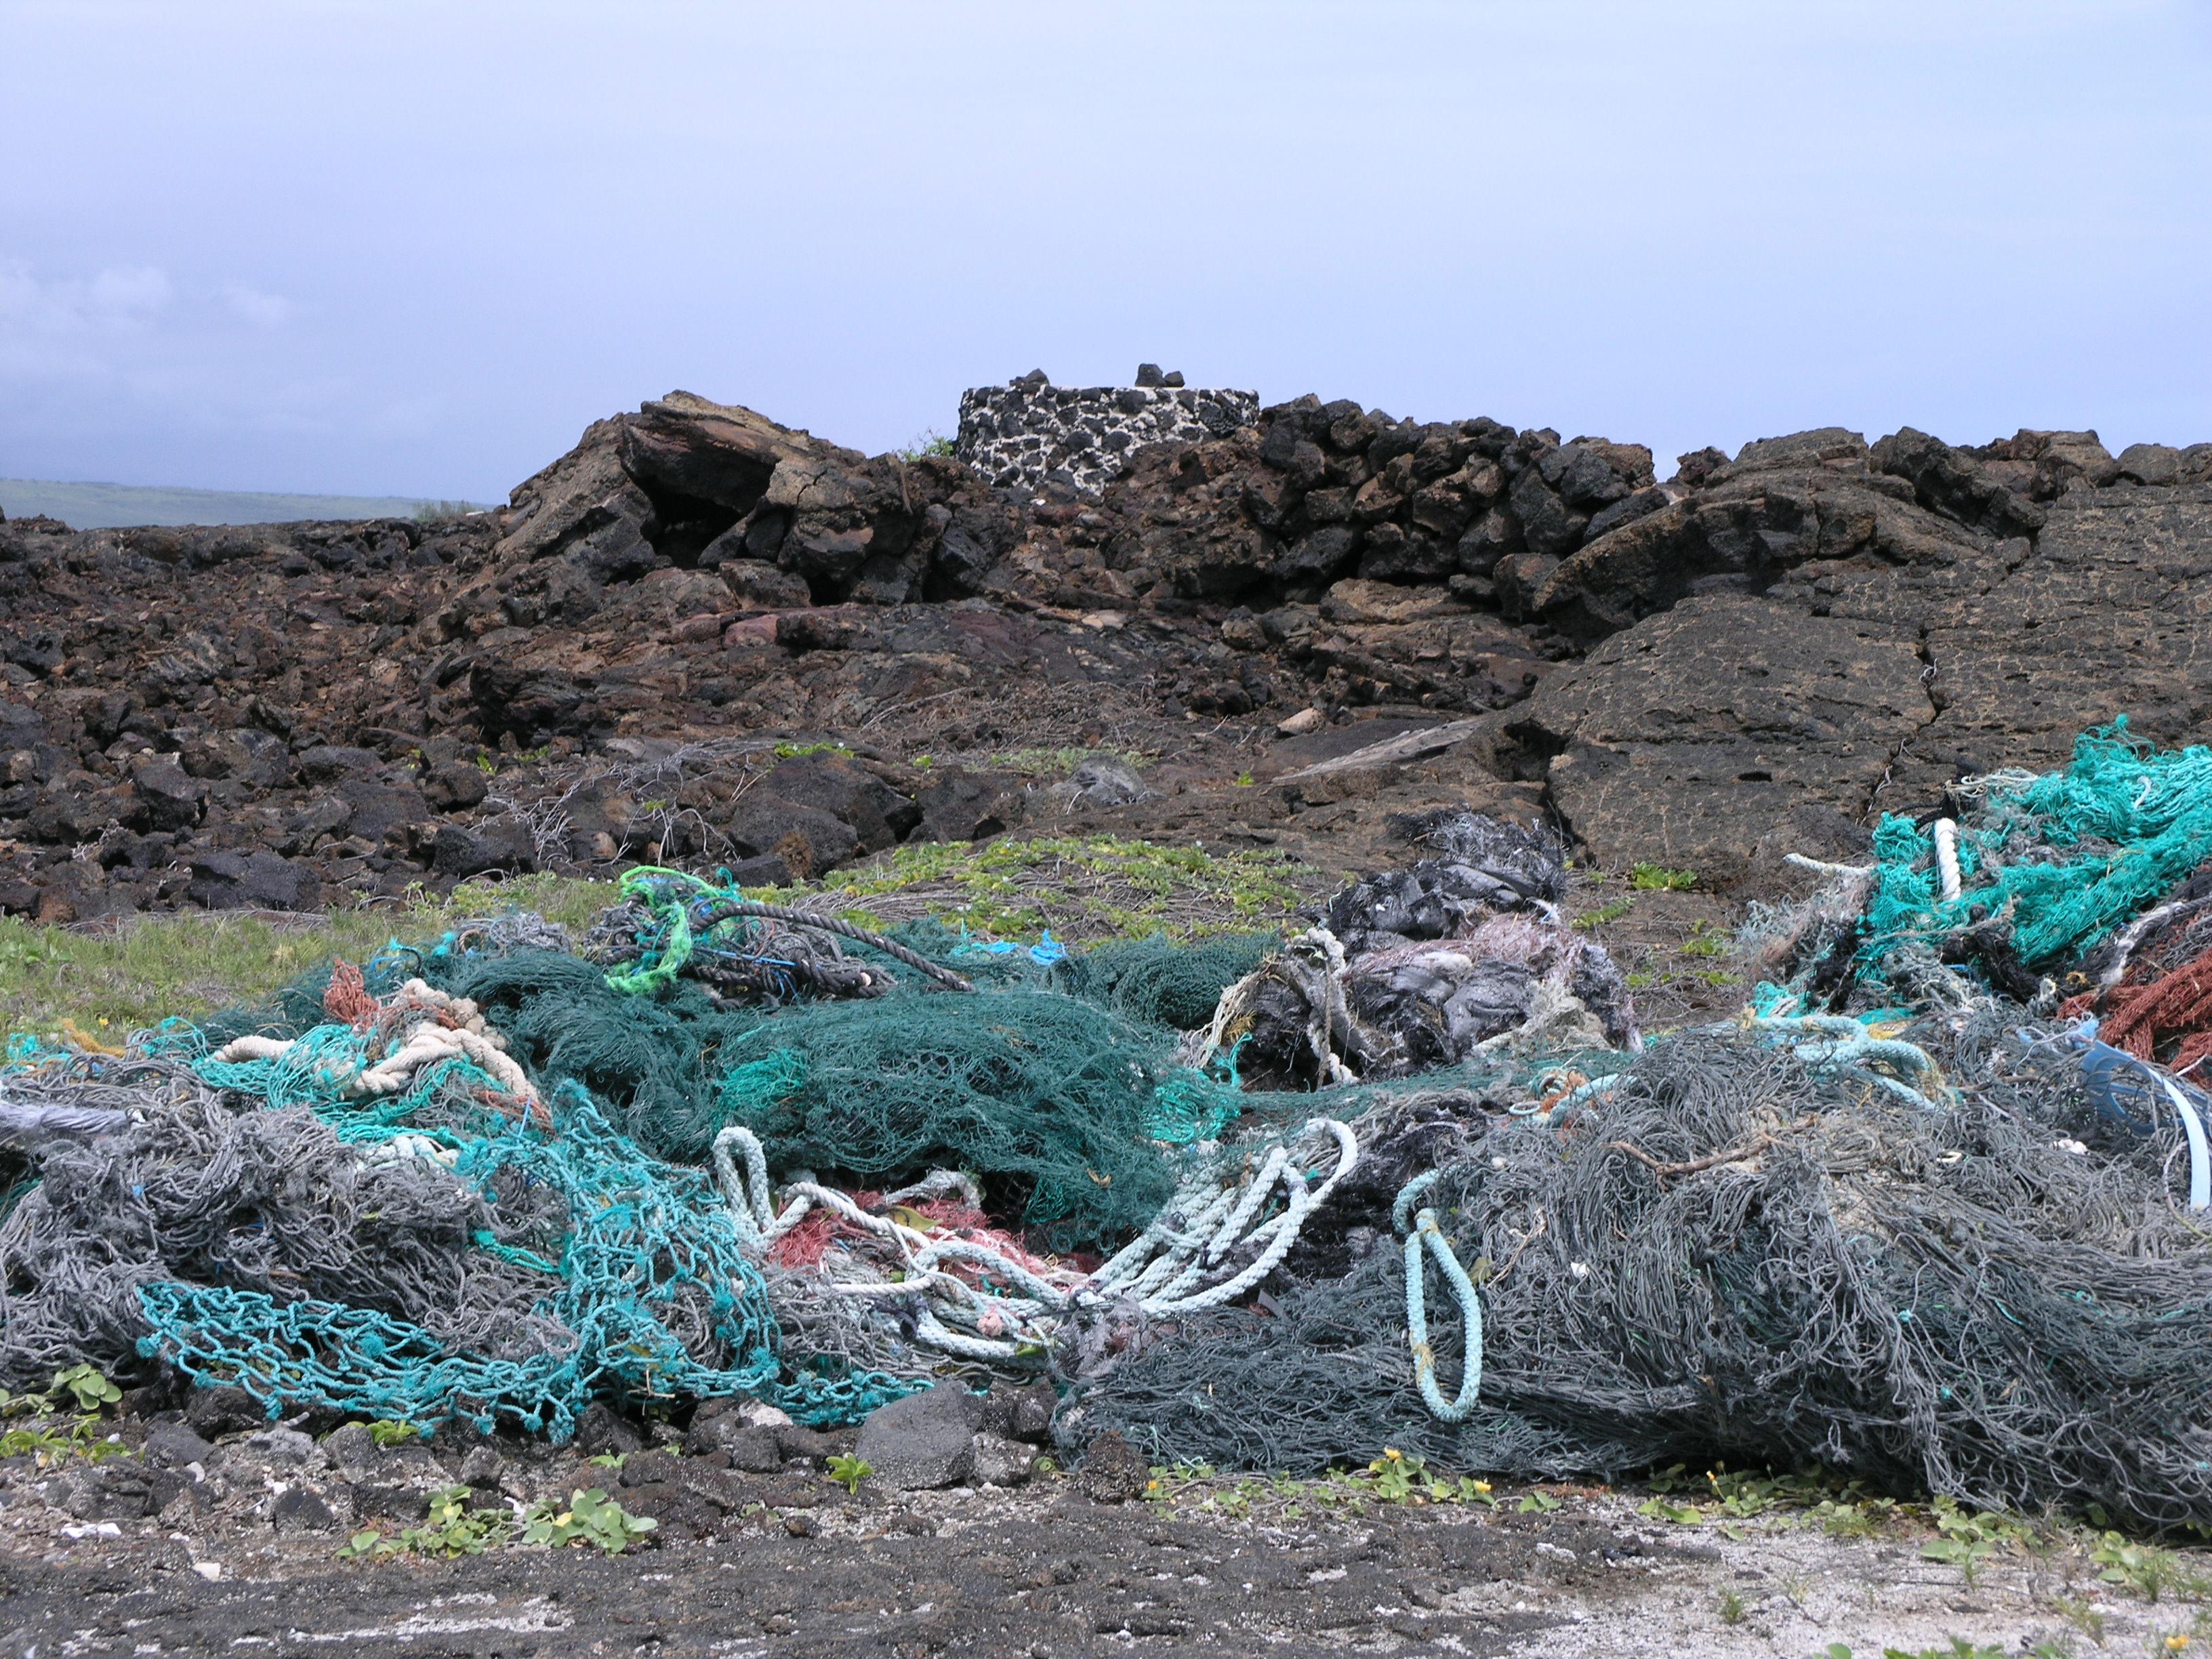 marine debris along coastline